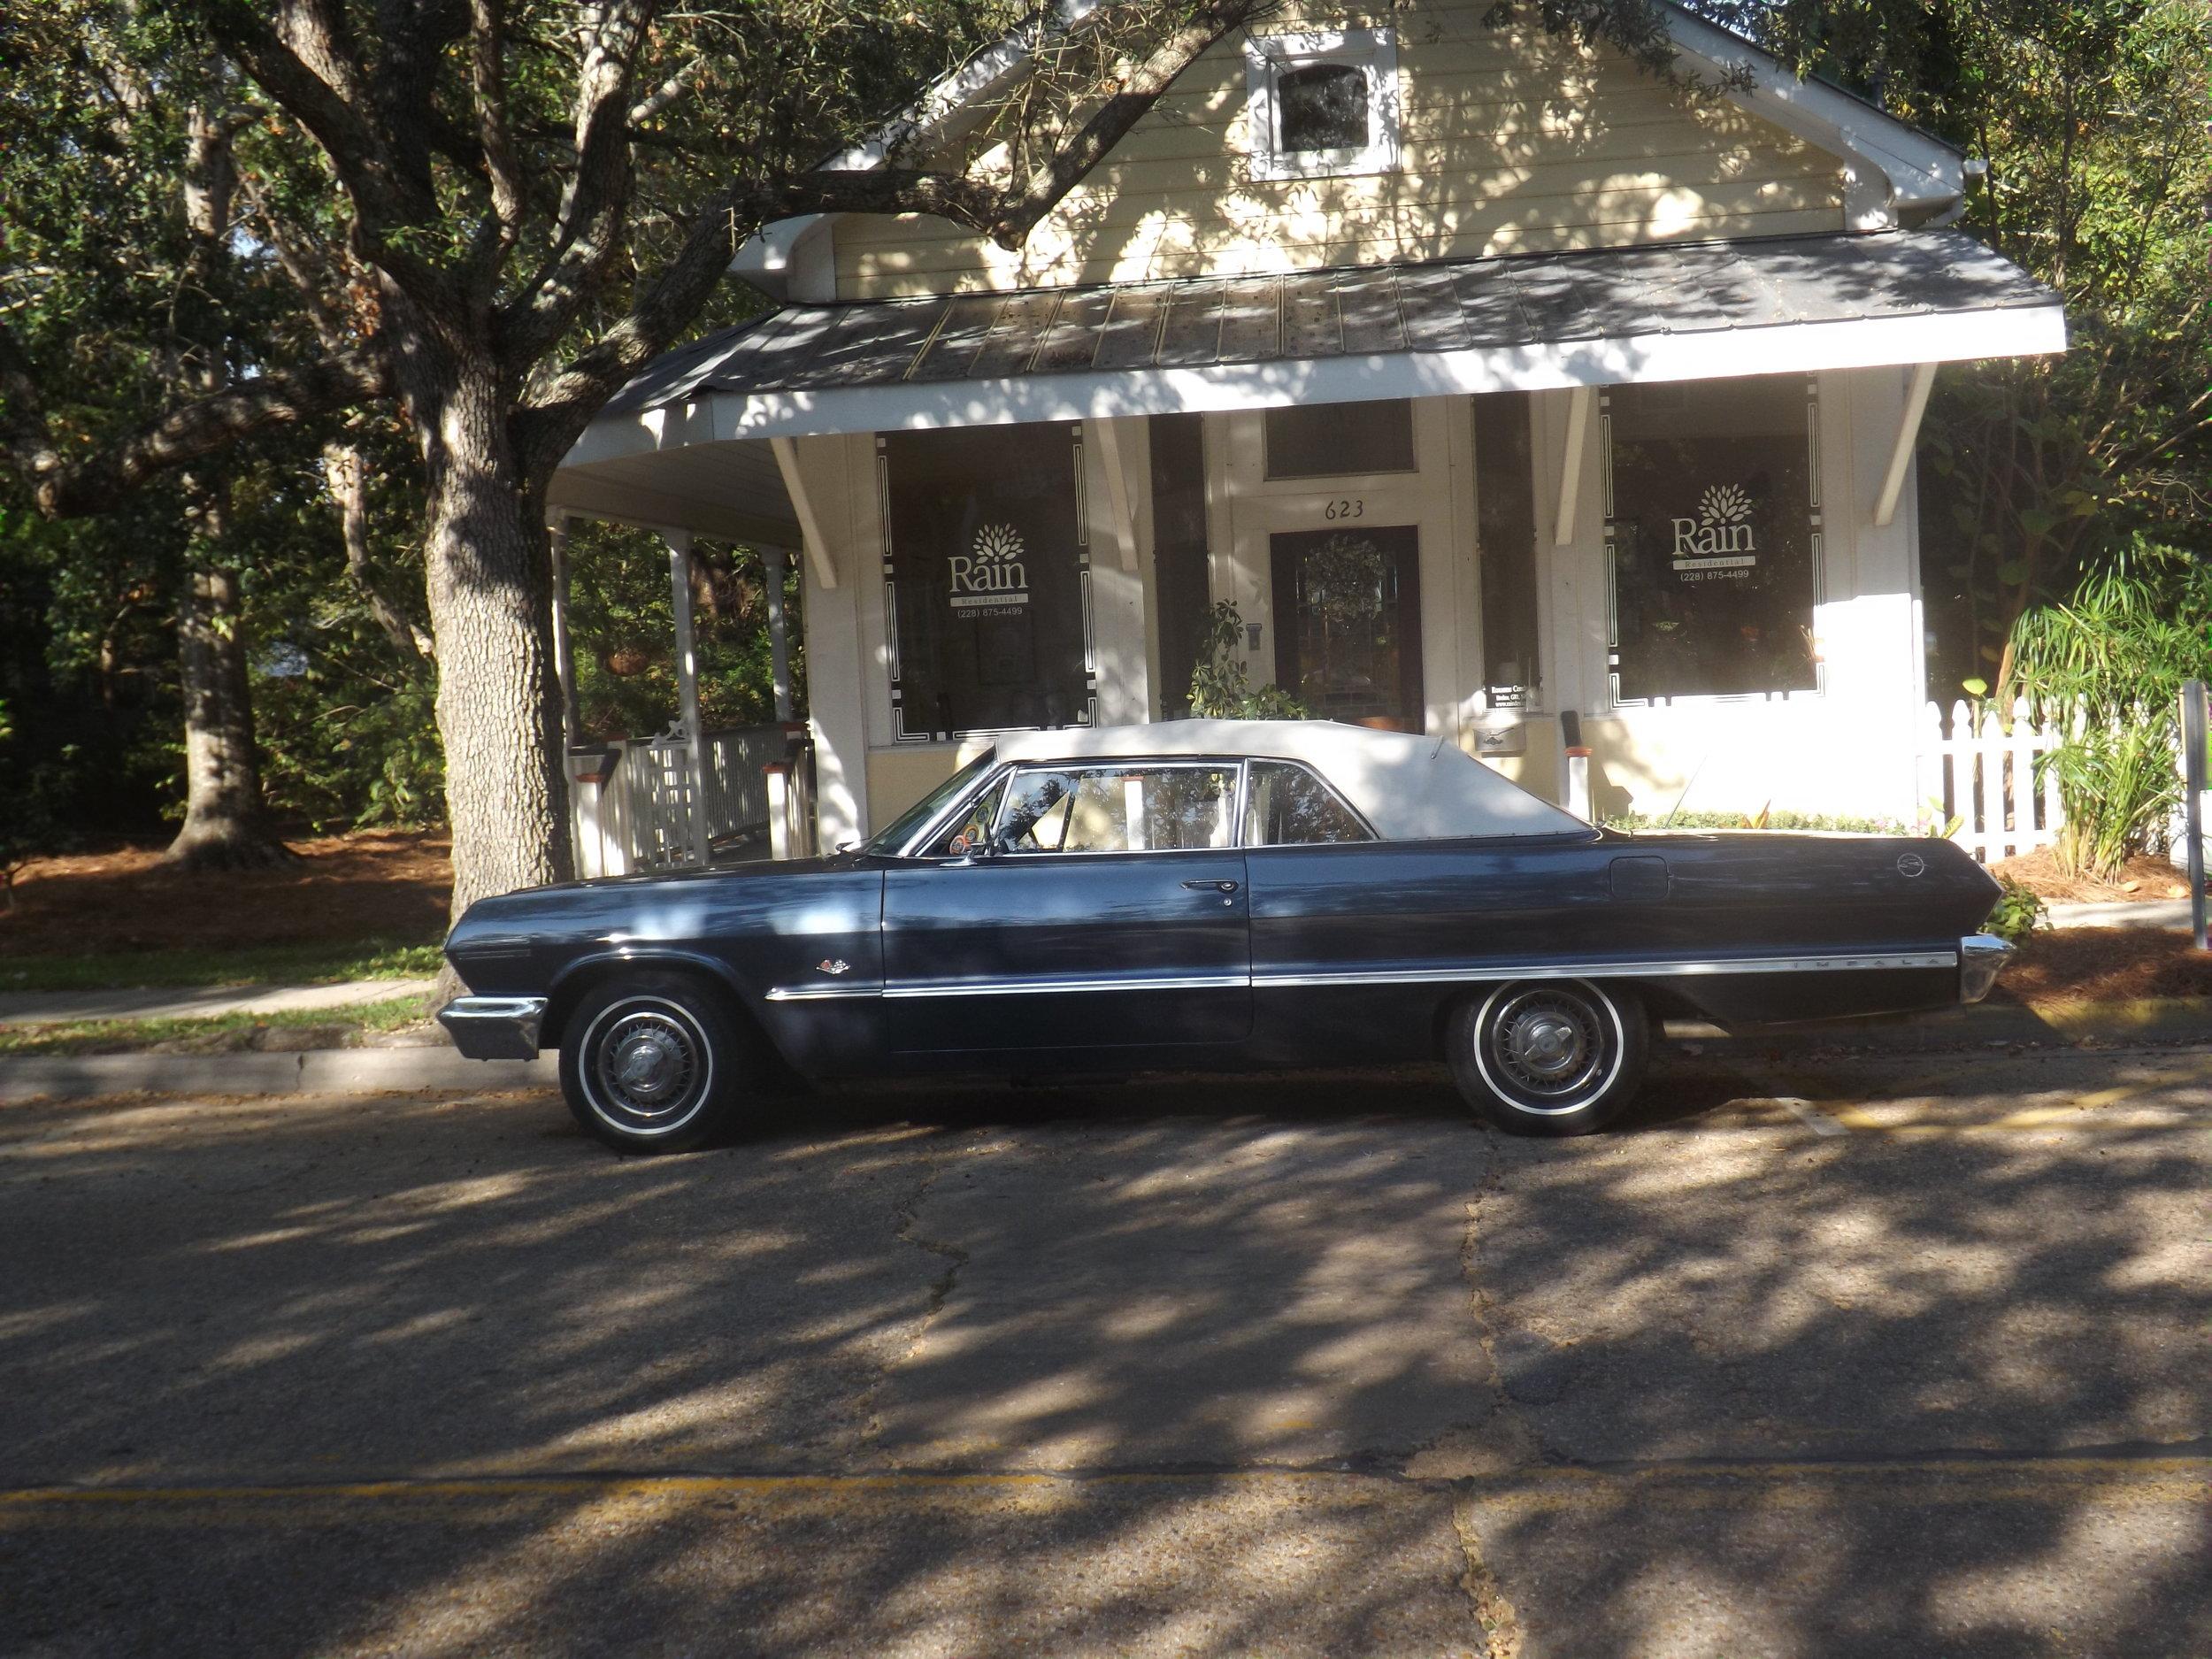 Gerry Doubleday.Cruisin' 2012.1963 Chevy Impala.JPG